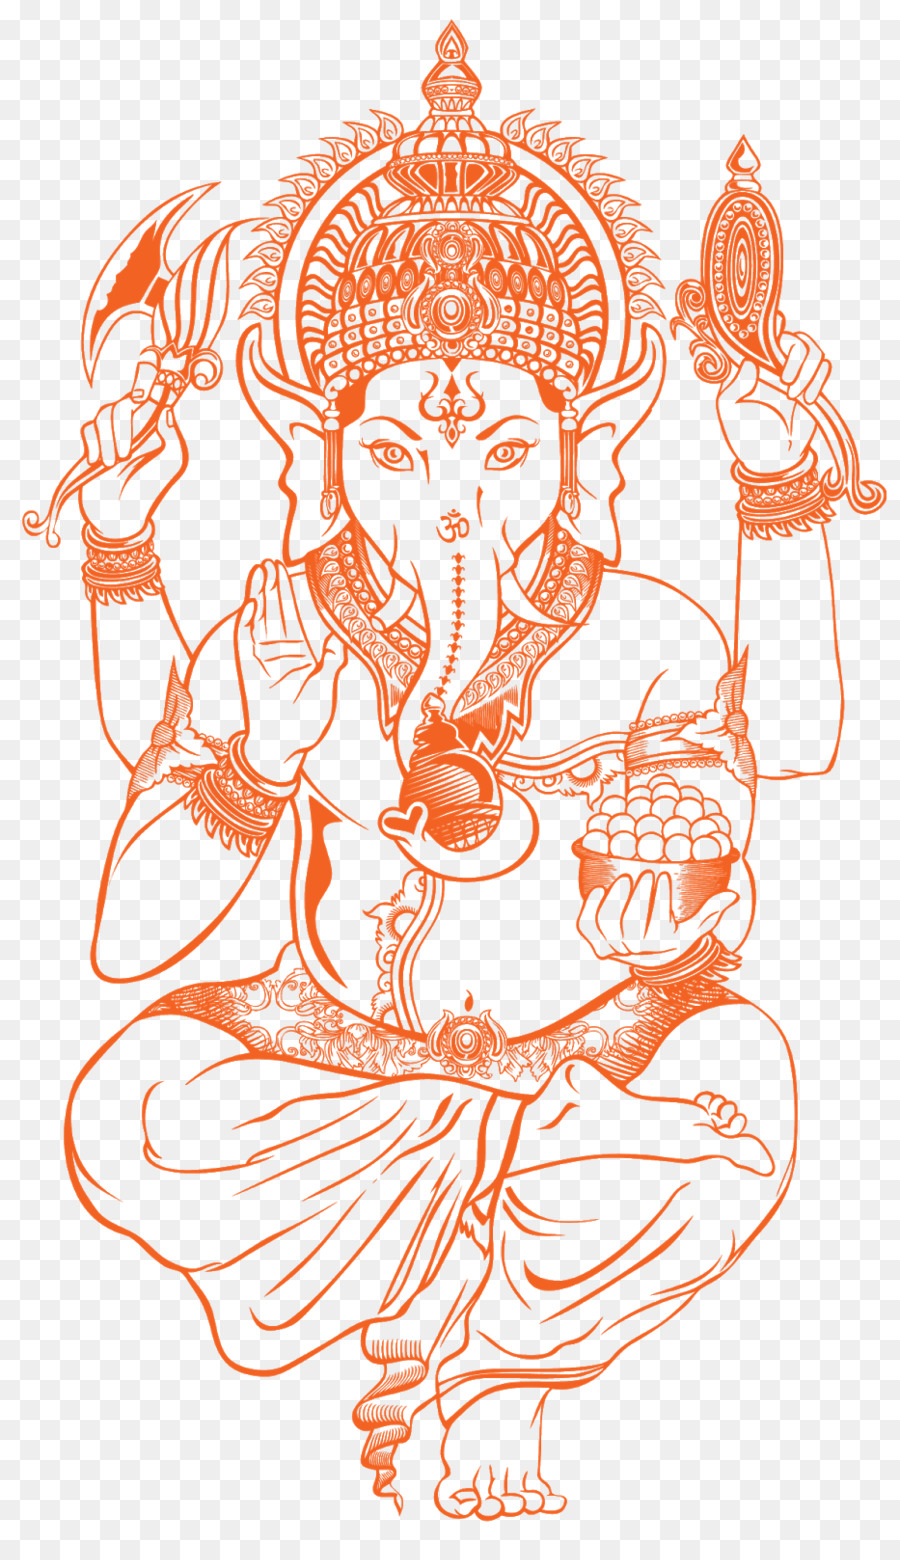 Ganesha Om Ganesh Chaturthi Religión - ganesha Formatos De Archivo ...